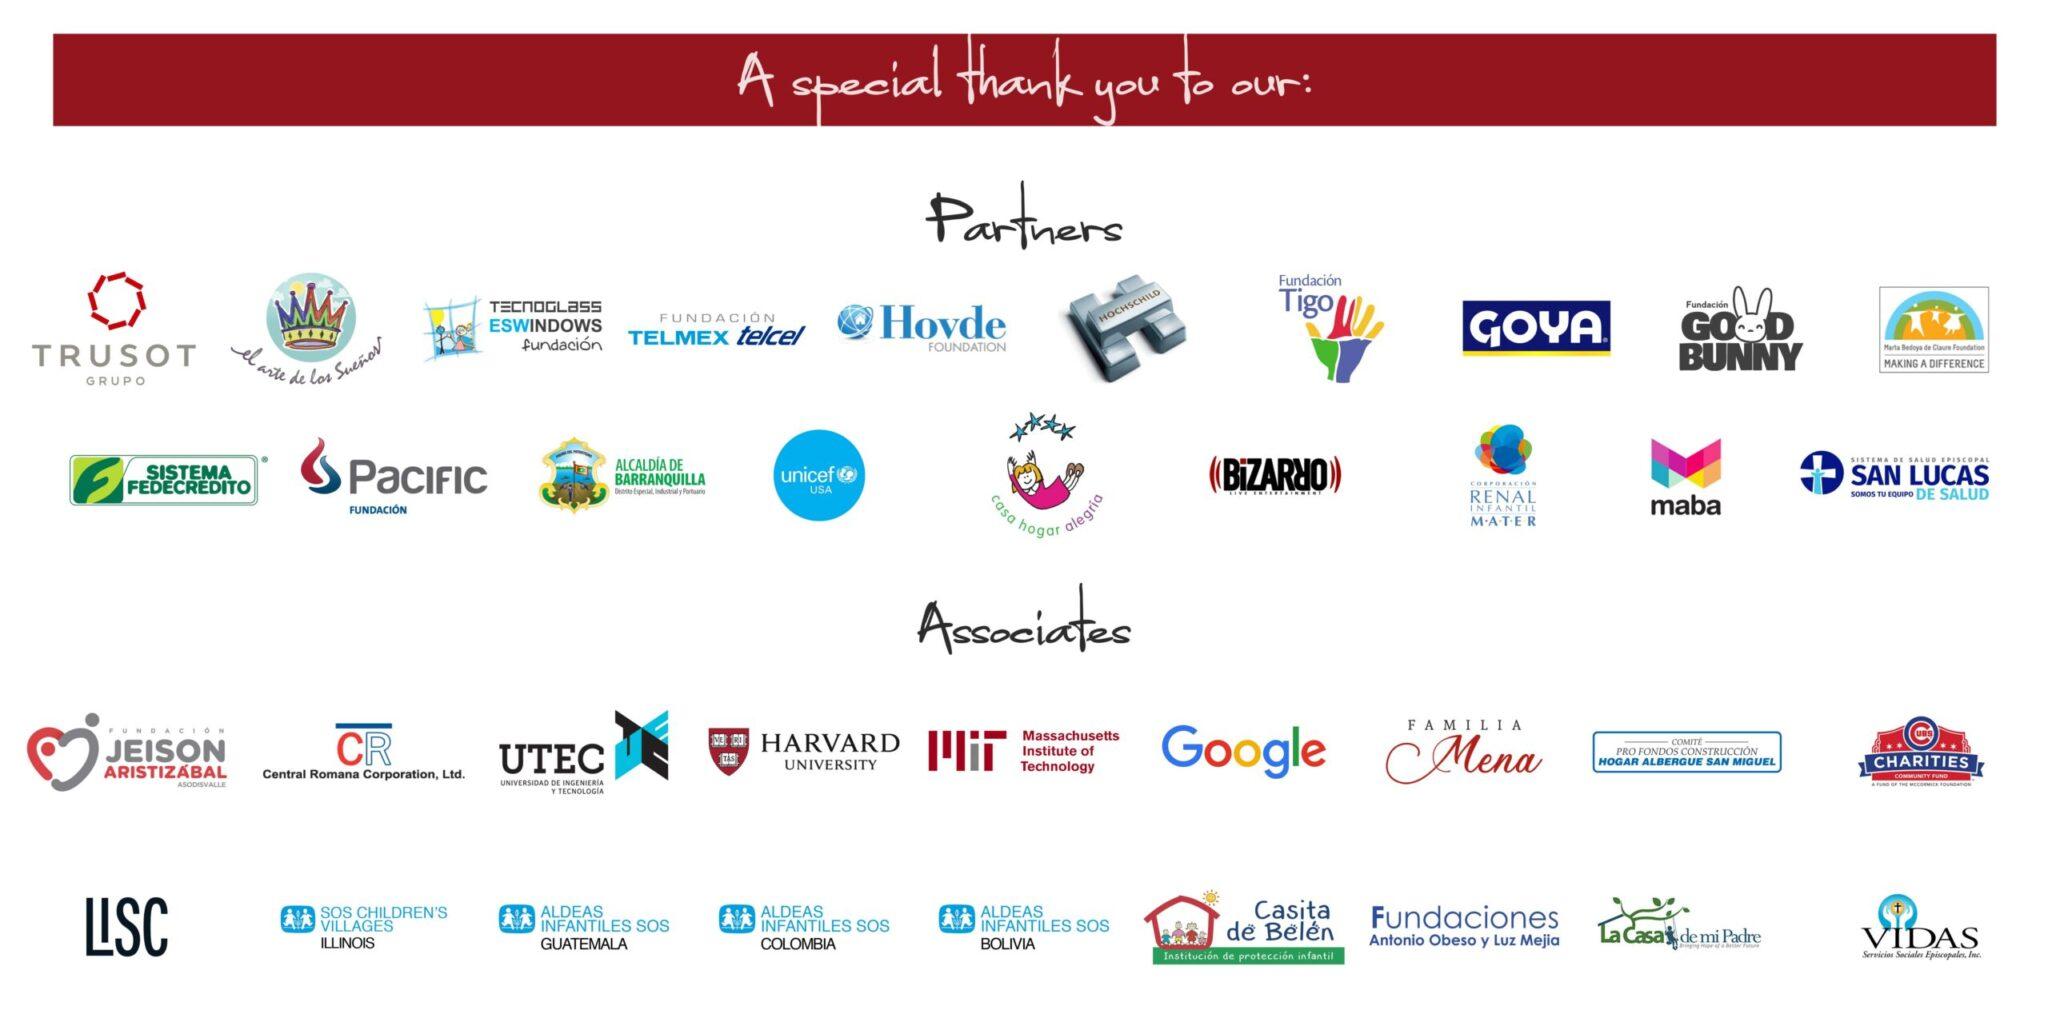 DD-thank-you-partners-spread